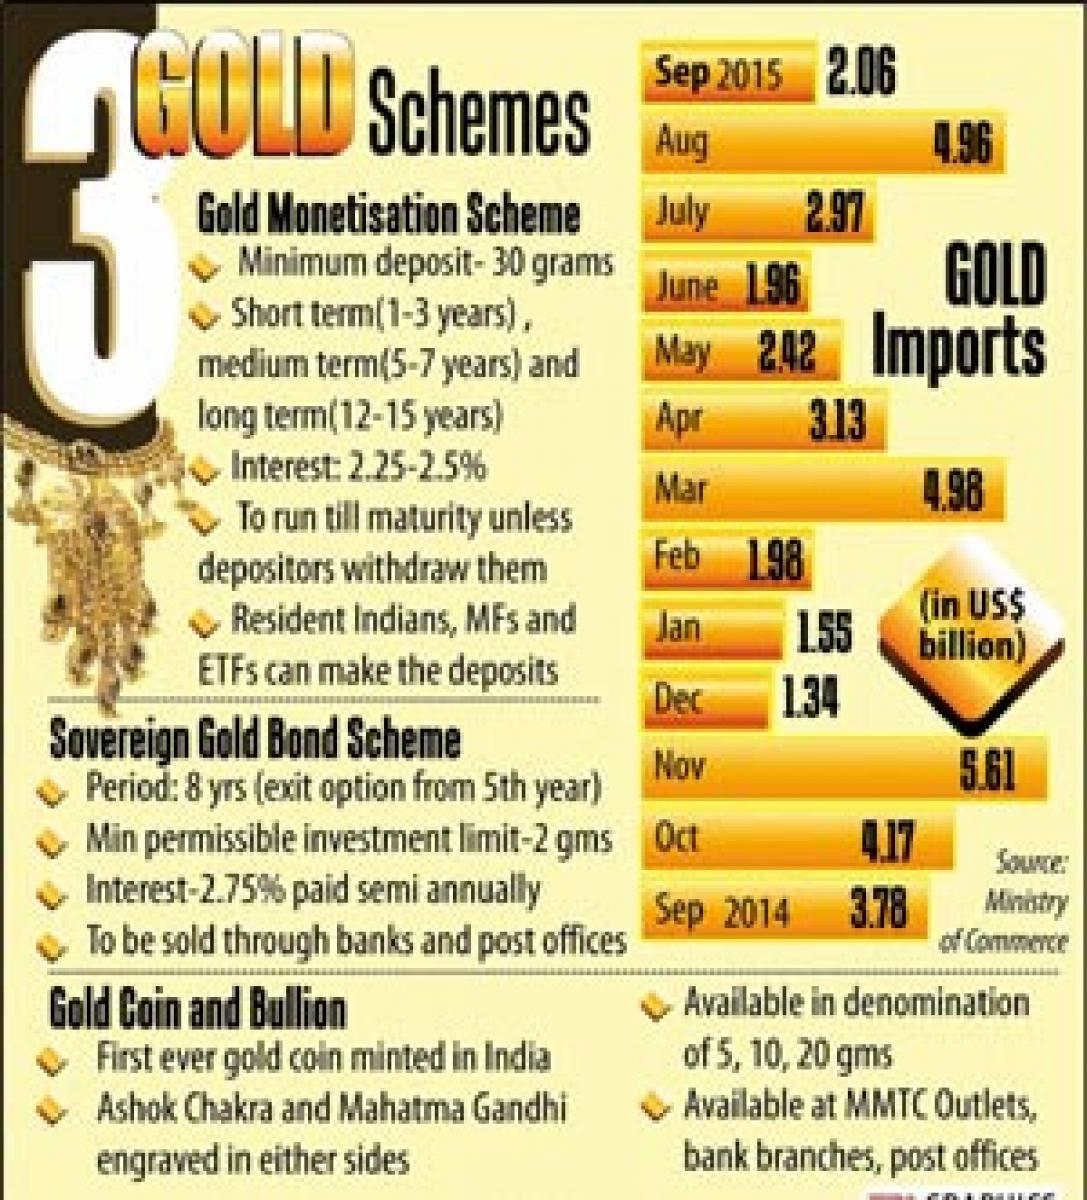 Modi launches gold schemes